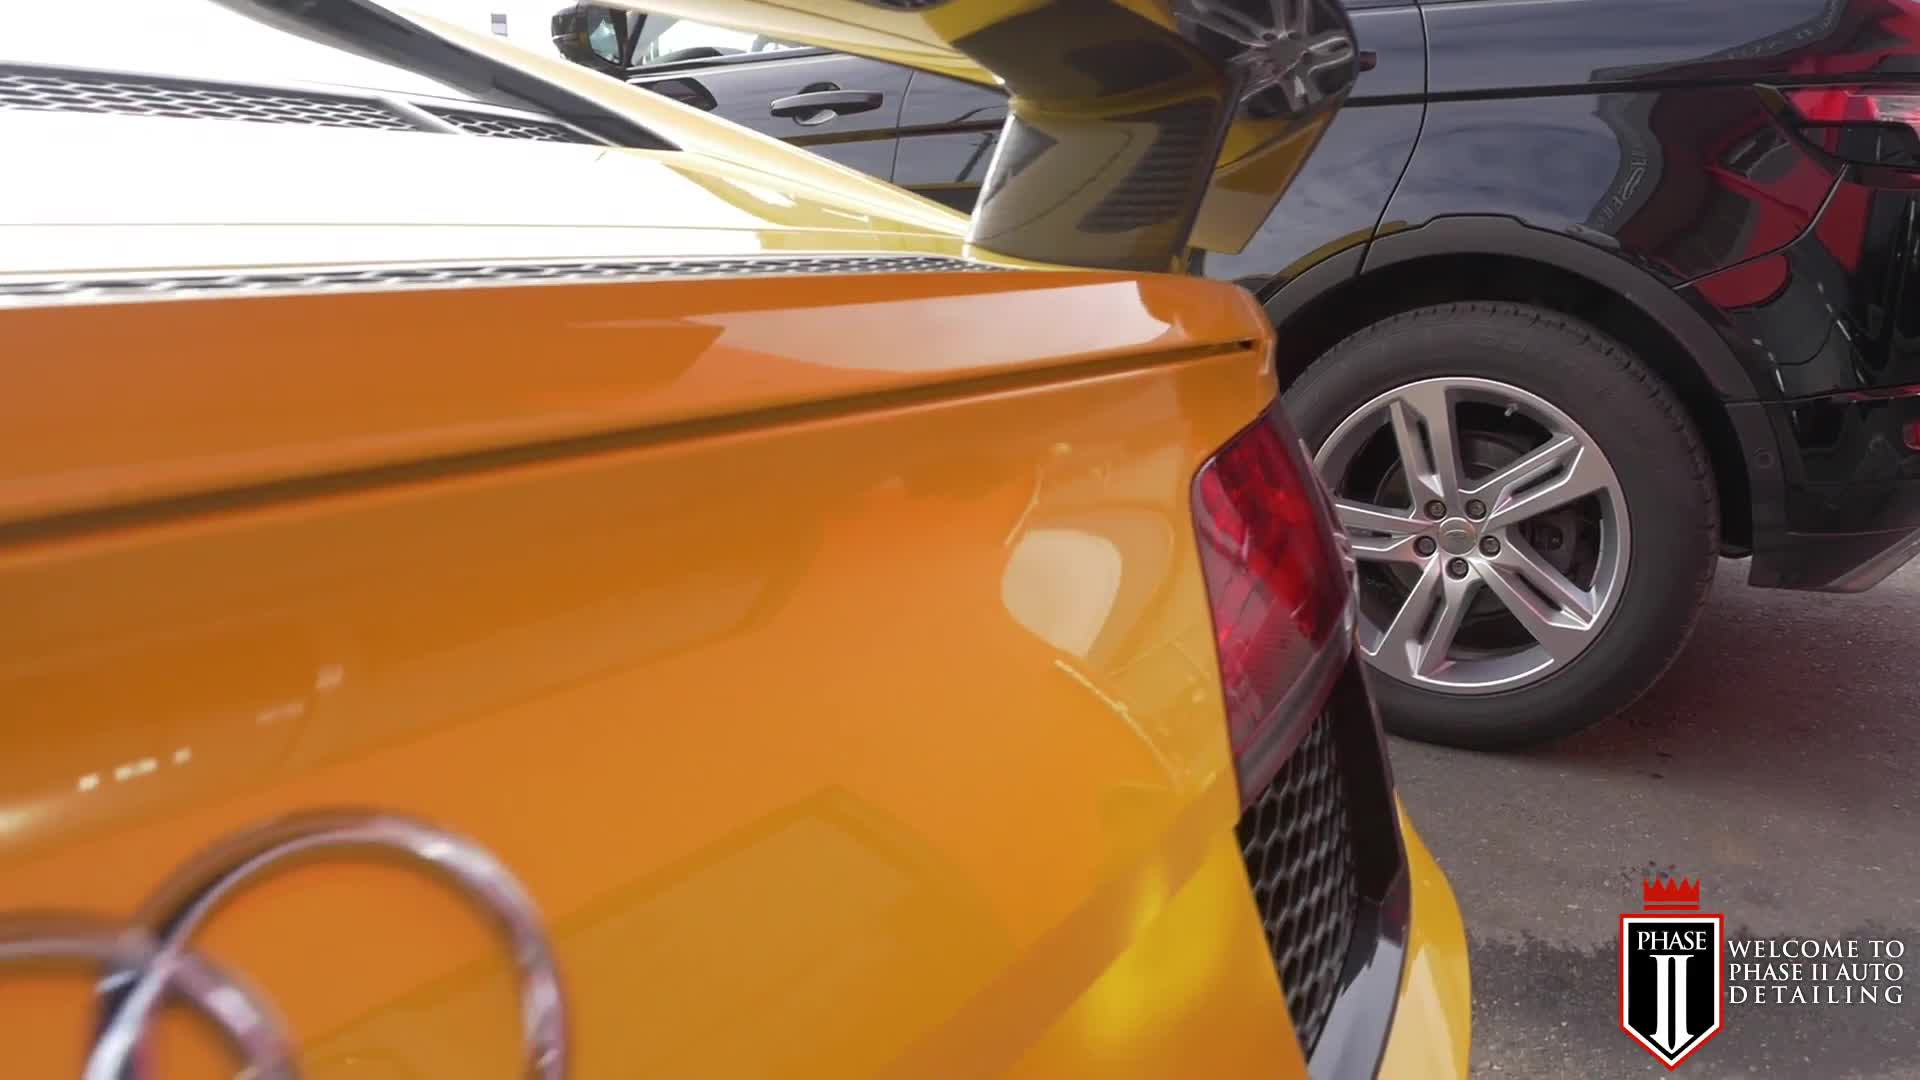 Phase II Auto Detailing Inc - Car Detailing - 778-278-6224